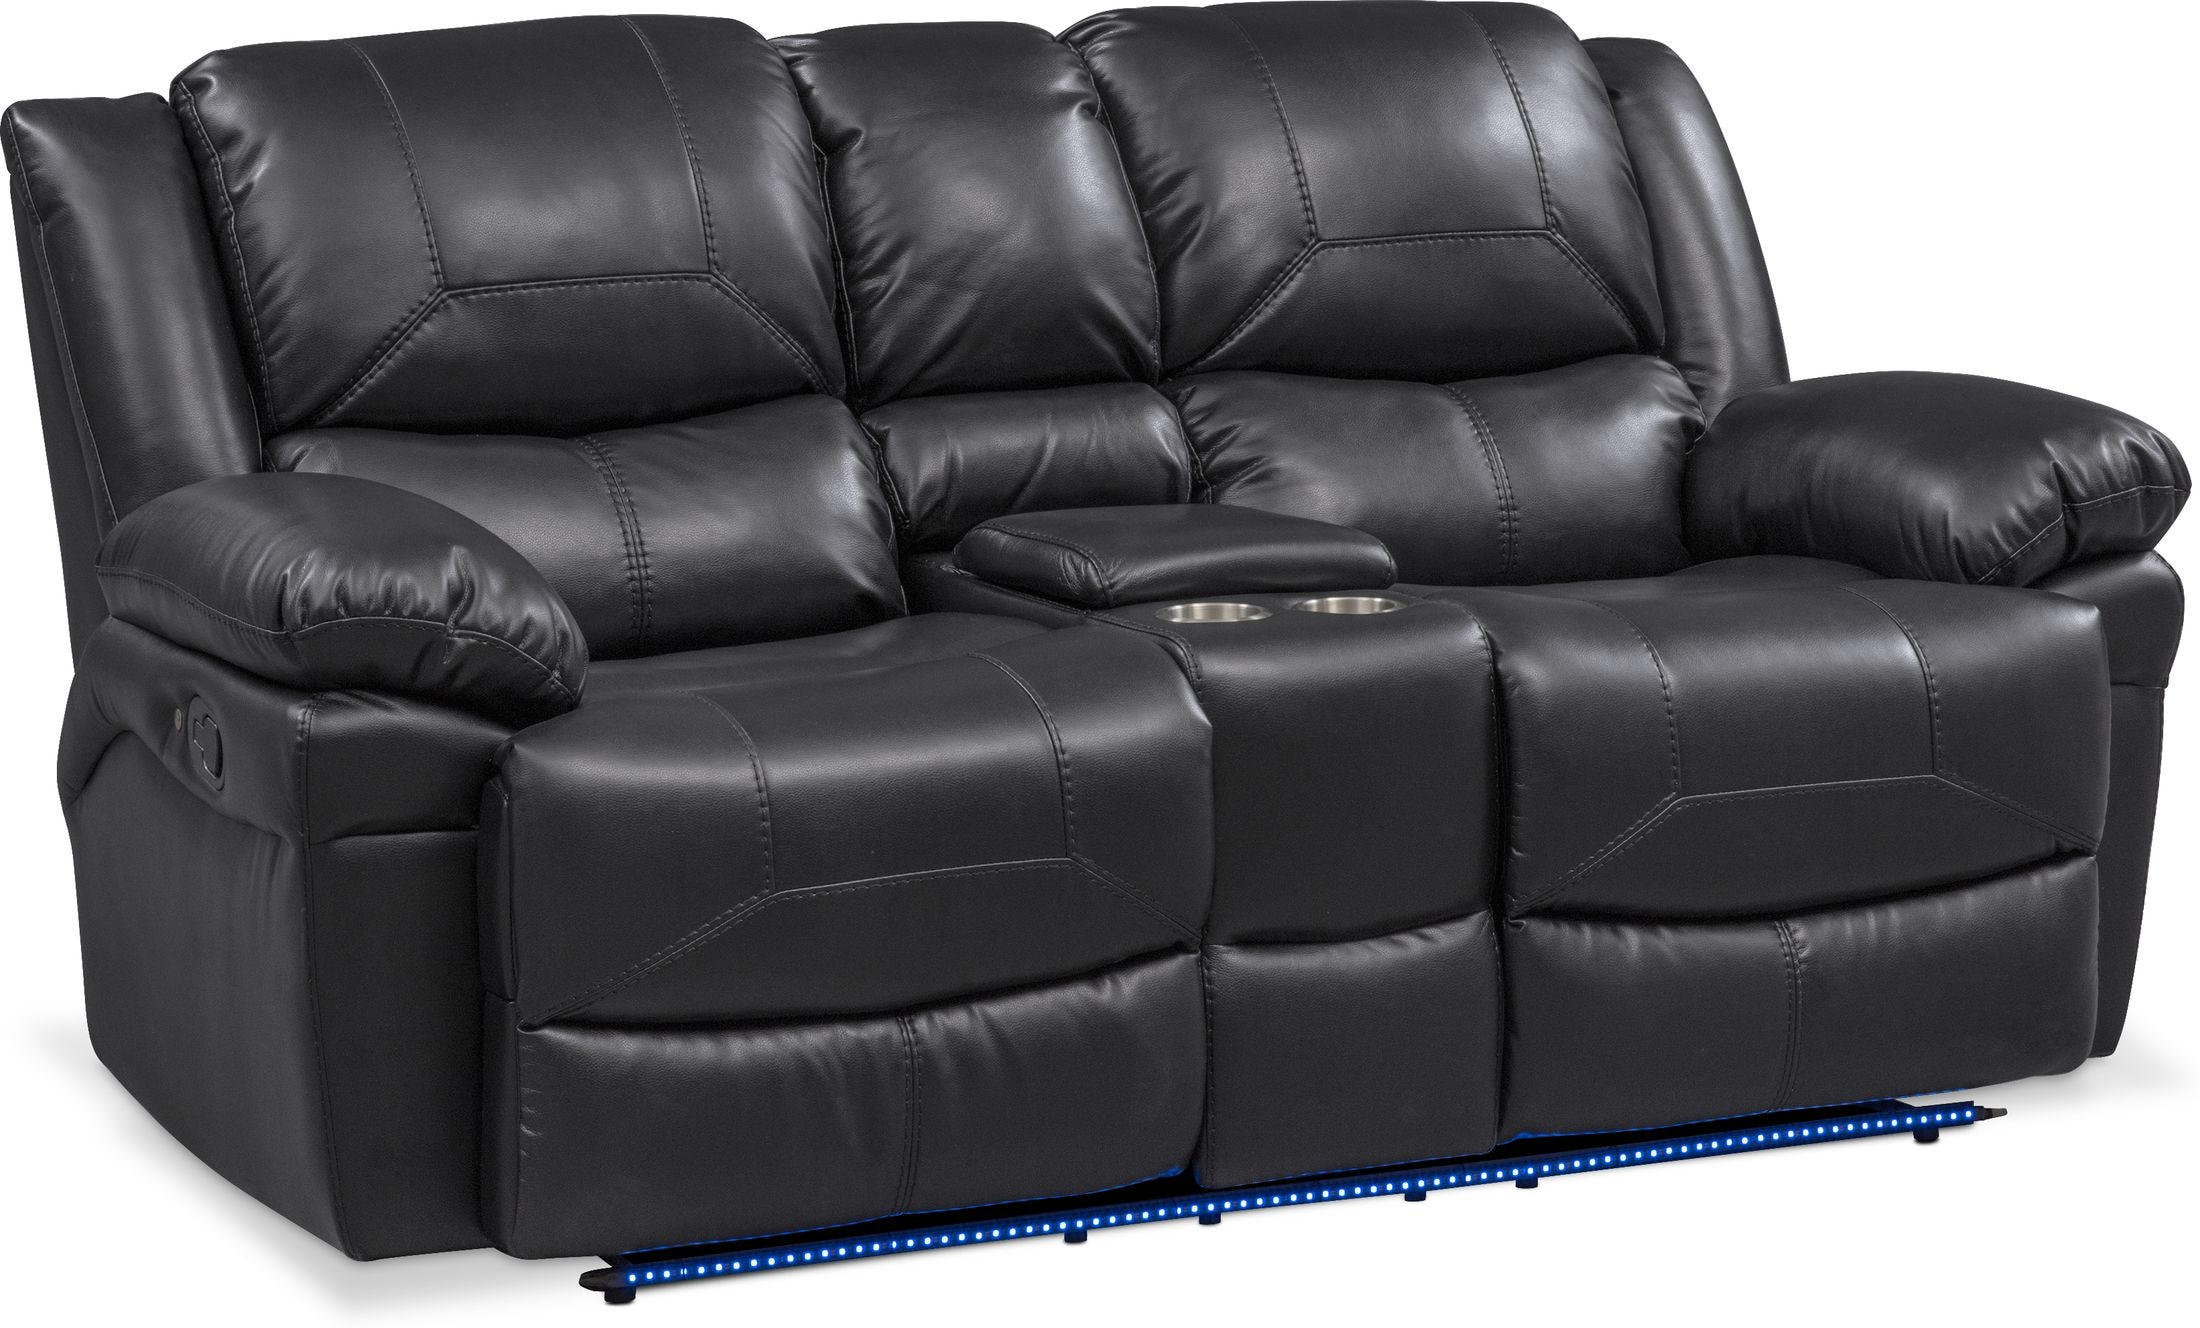 Living Room Furniture - Monza Manual Reclining Loveseat